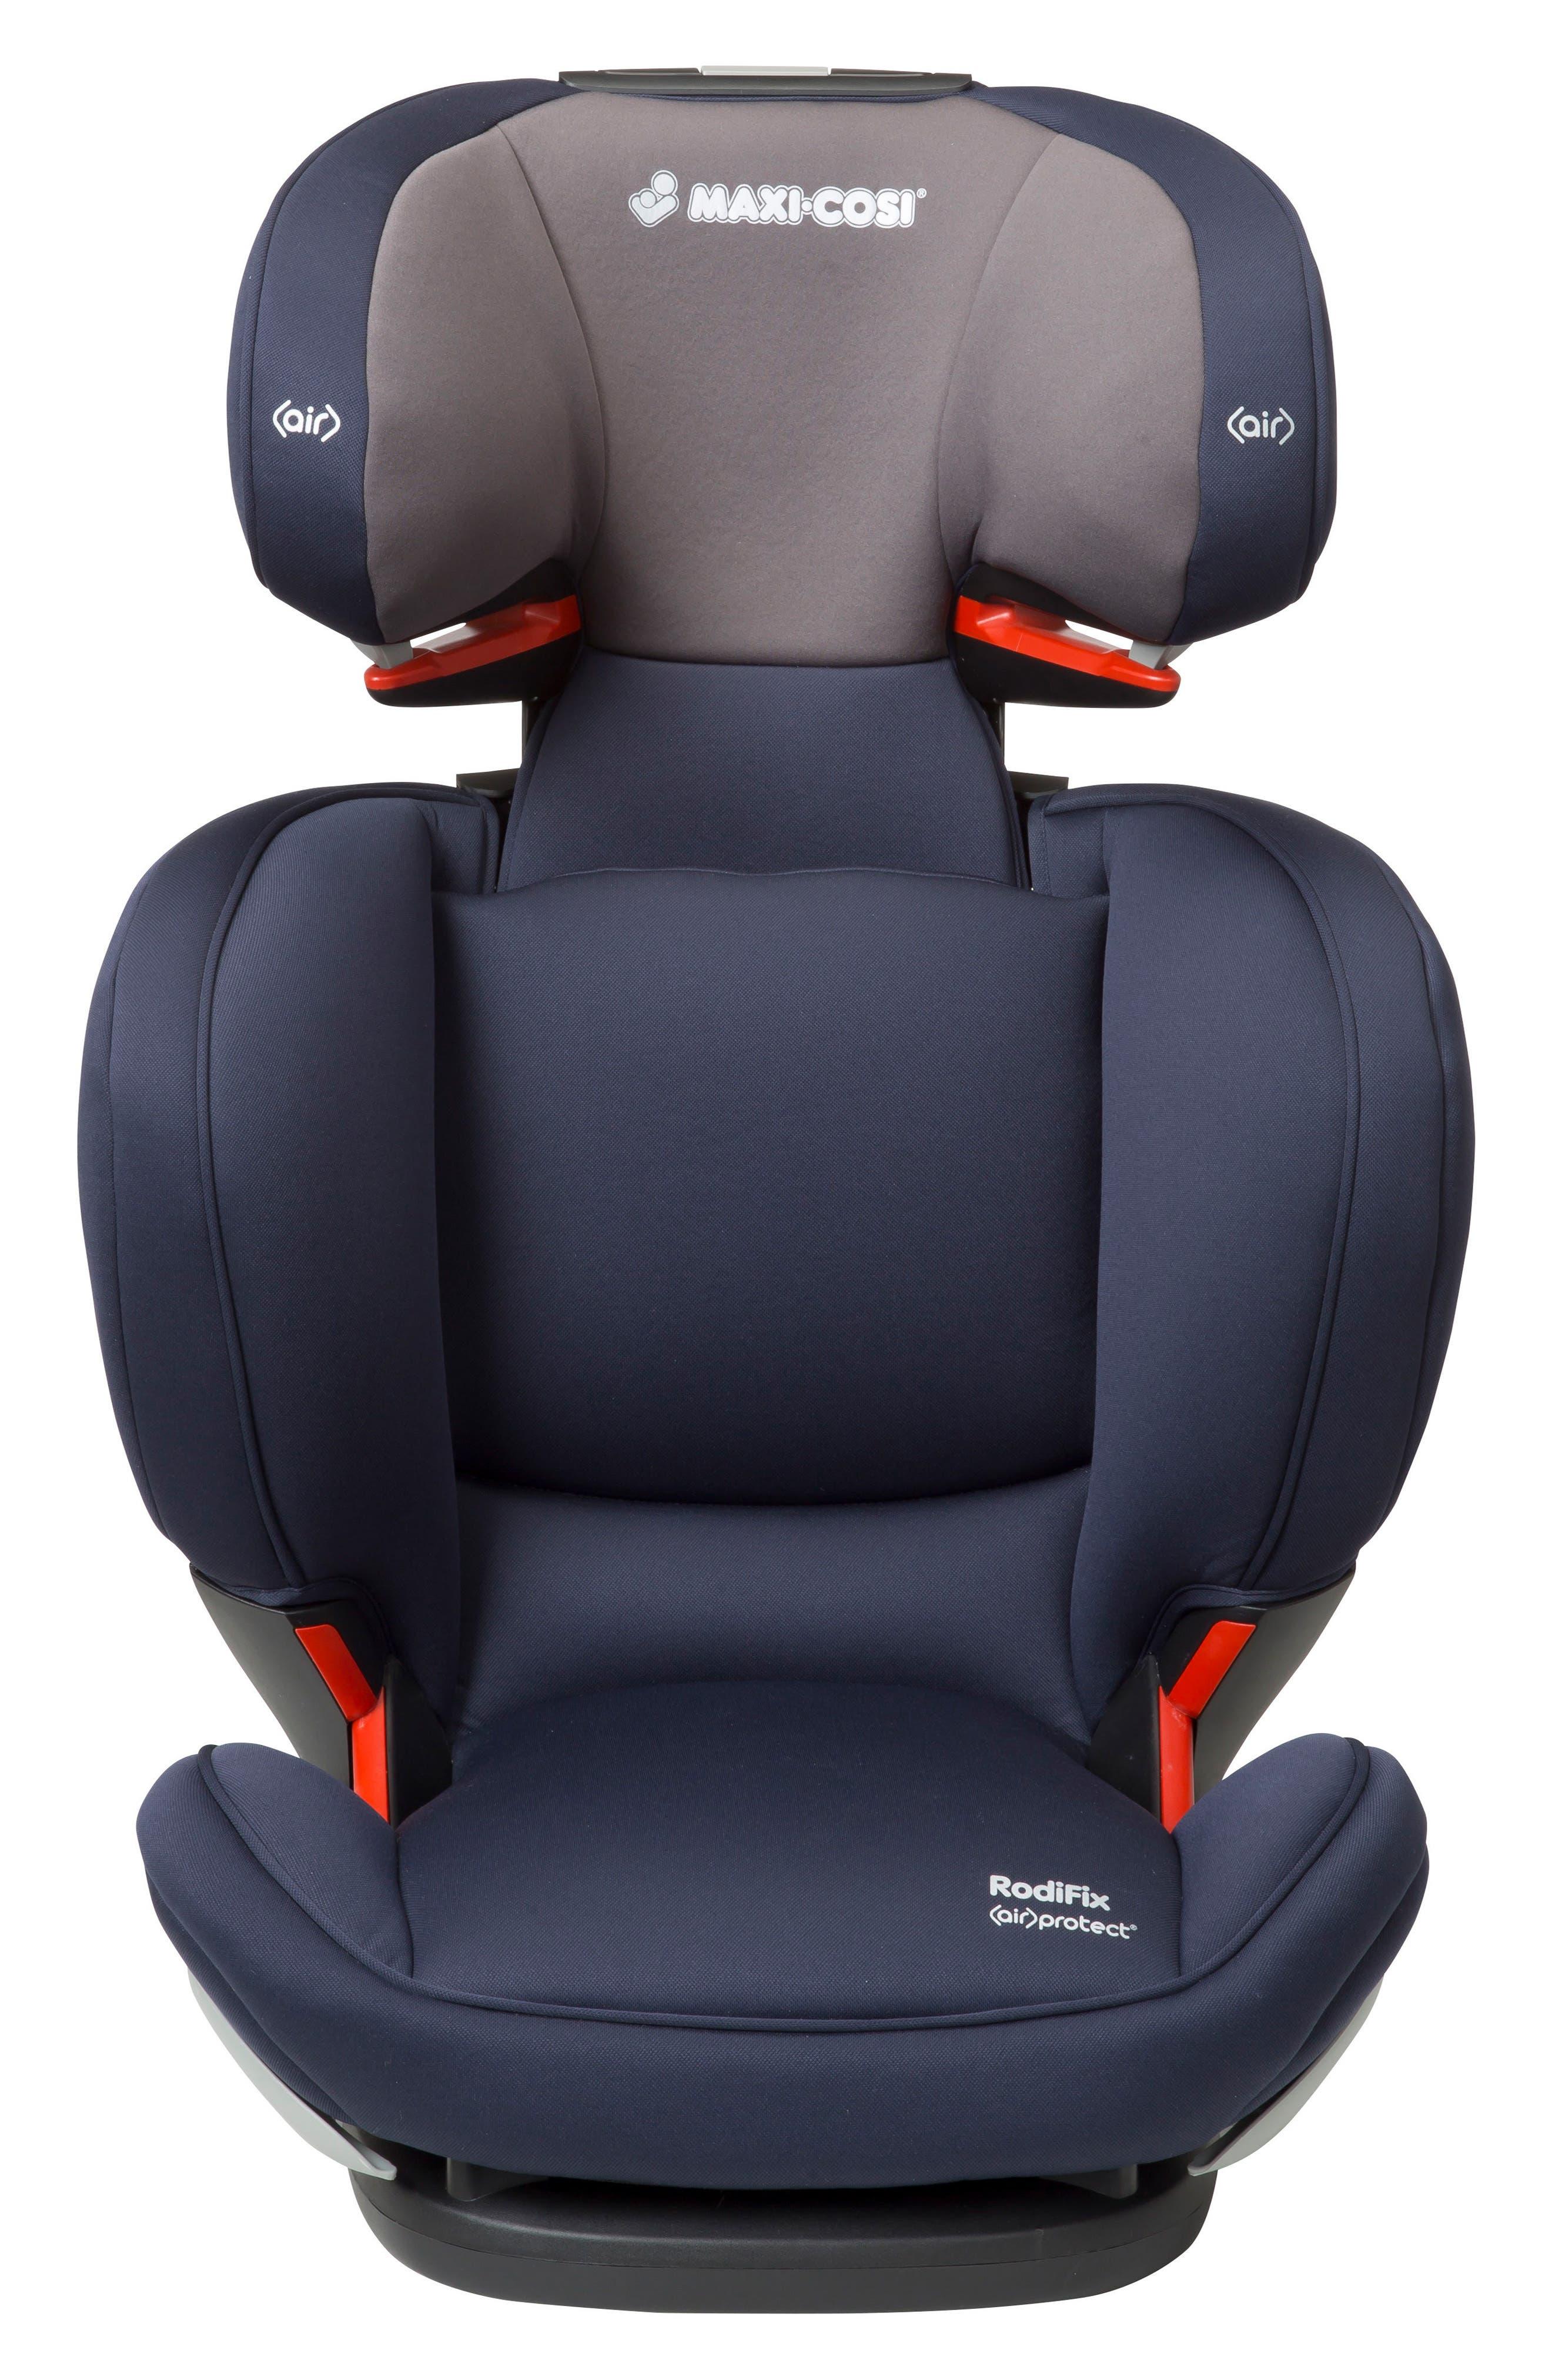 RodiFix Booster Car Seat,                         Main,                         color, Navy